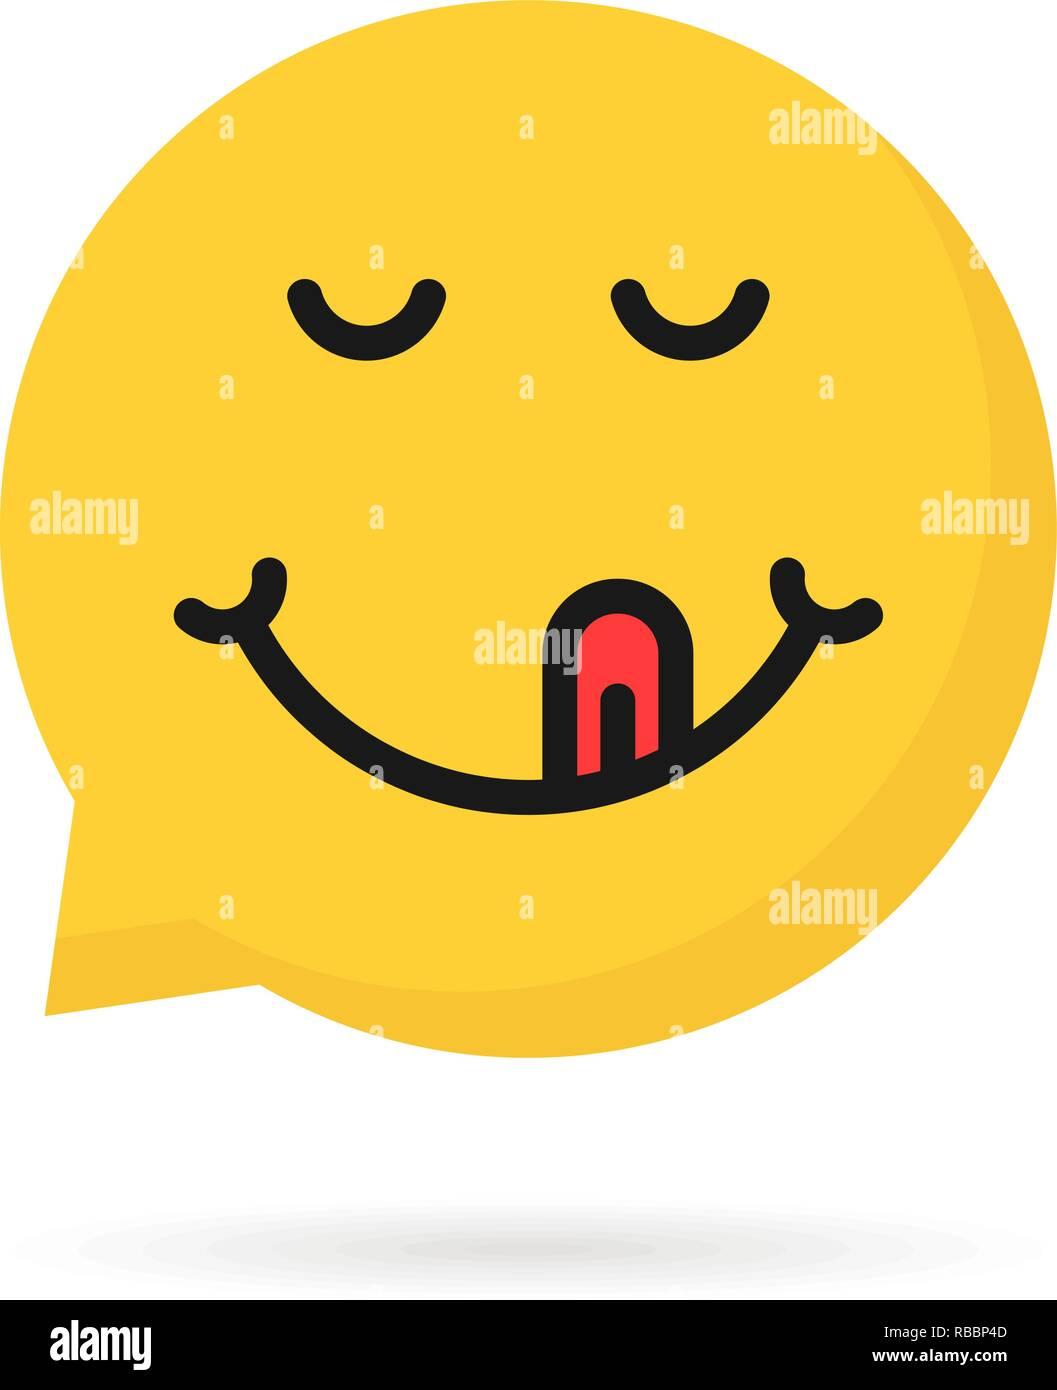 yummy emoji speech bubble logo Stock Vector Art & Illustration